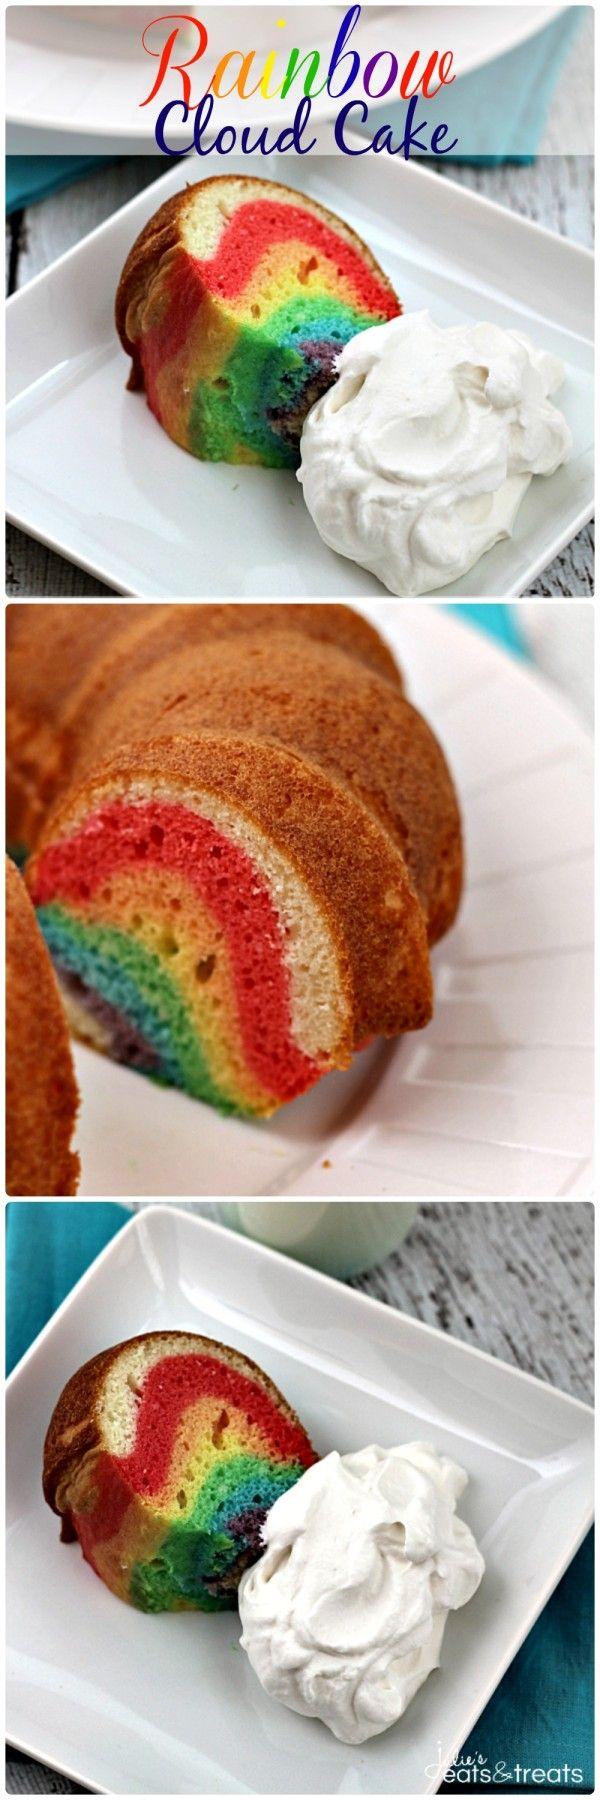 Rainbow Cloud Cake